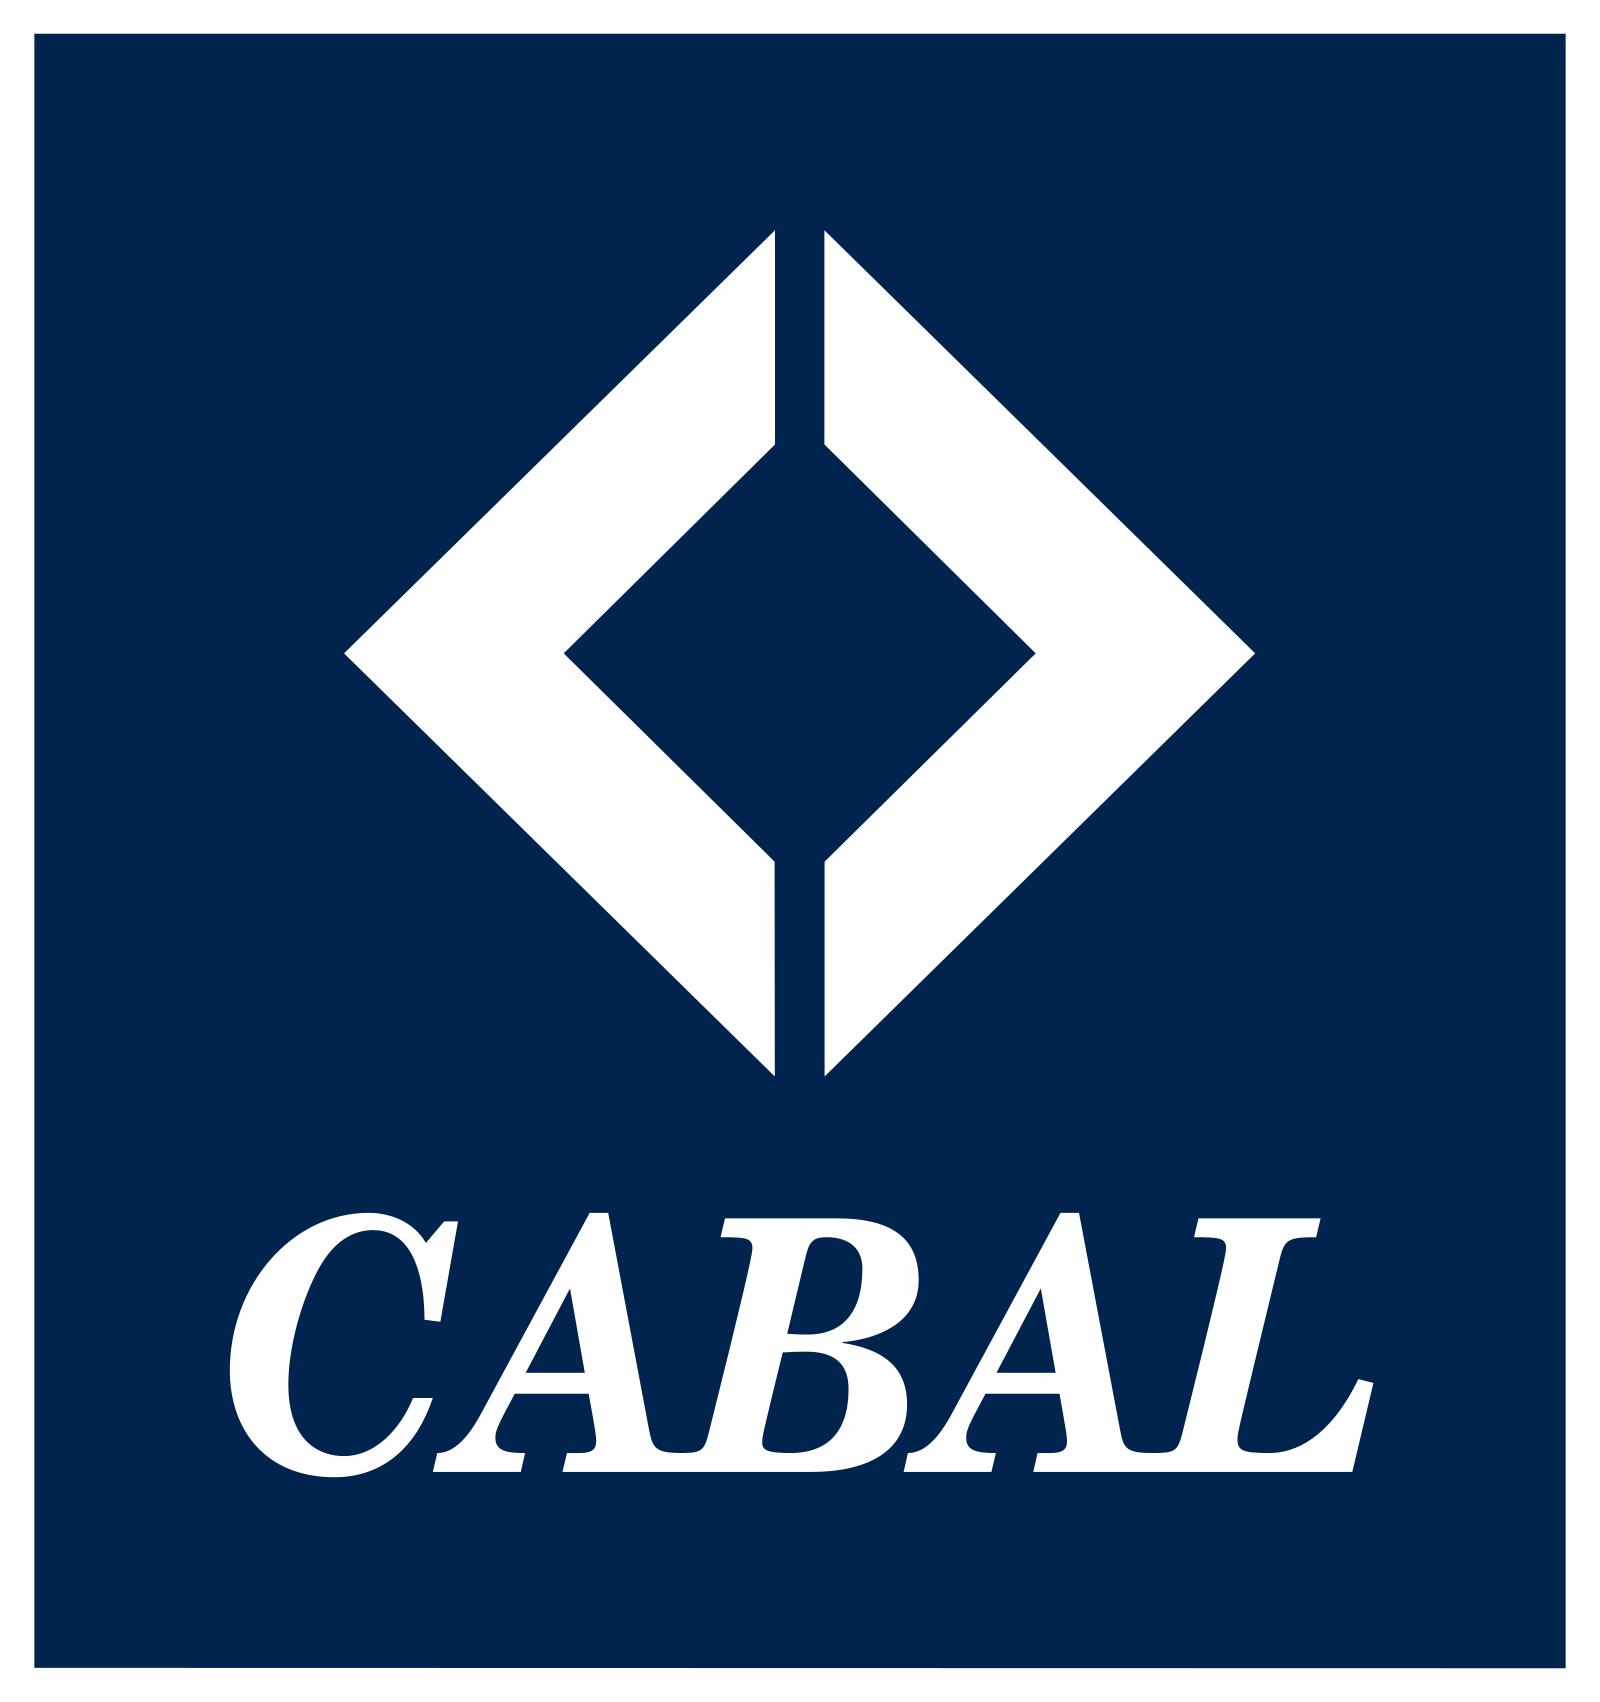 cabal logo cartao 2 - Cabal Logo - Cartão Cabal Logo